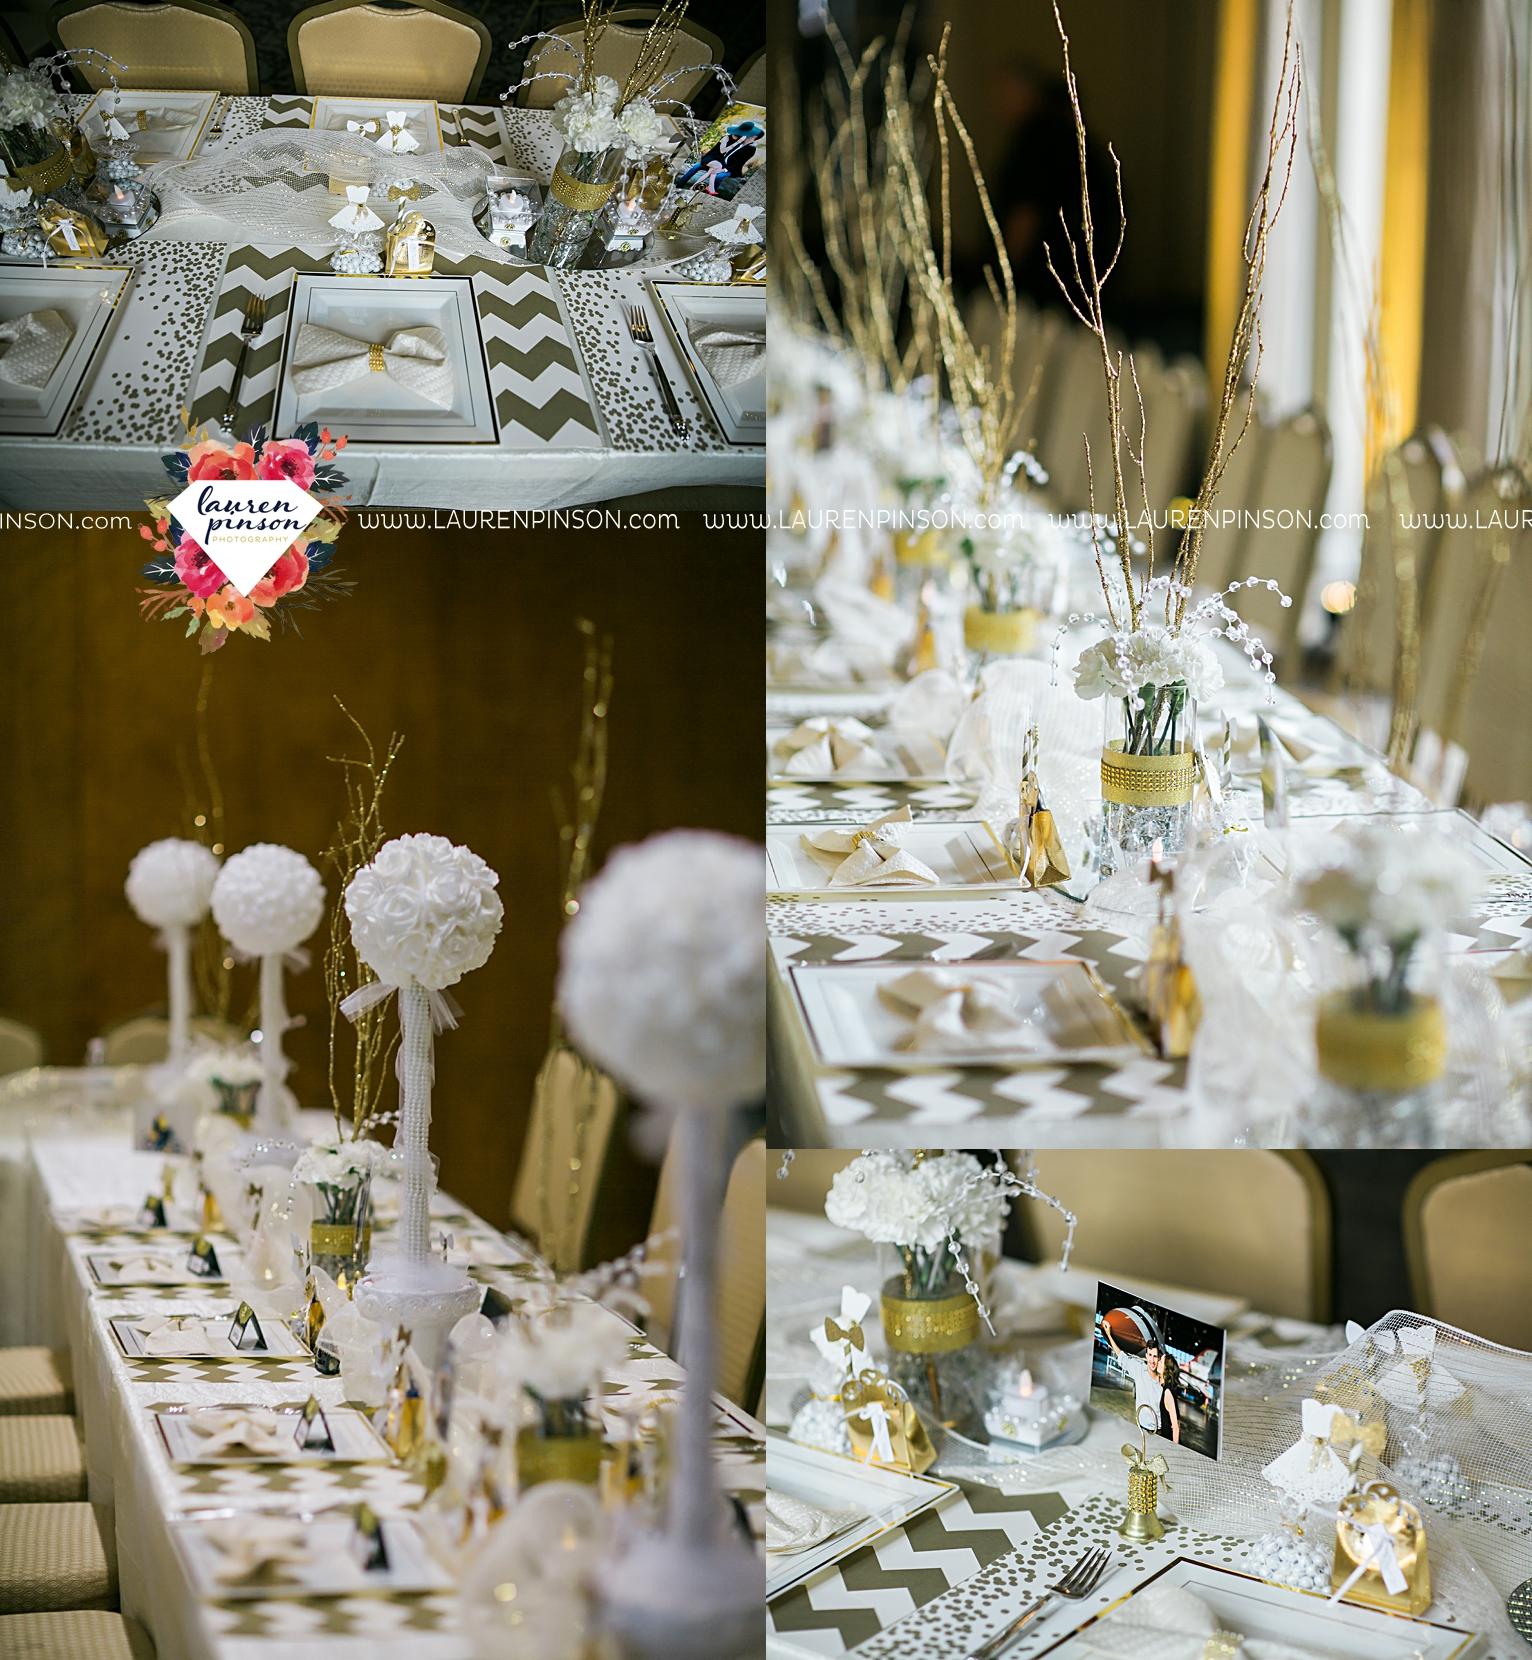 wichita-falls-texas-wedding-photographer-the-forum-by-the-kemp-mayfield-events-ulta-gold-glitter_2853.jpg